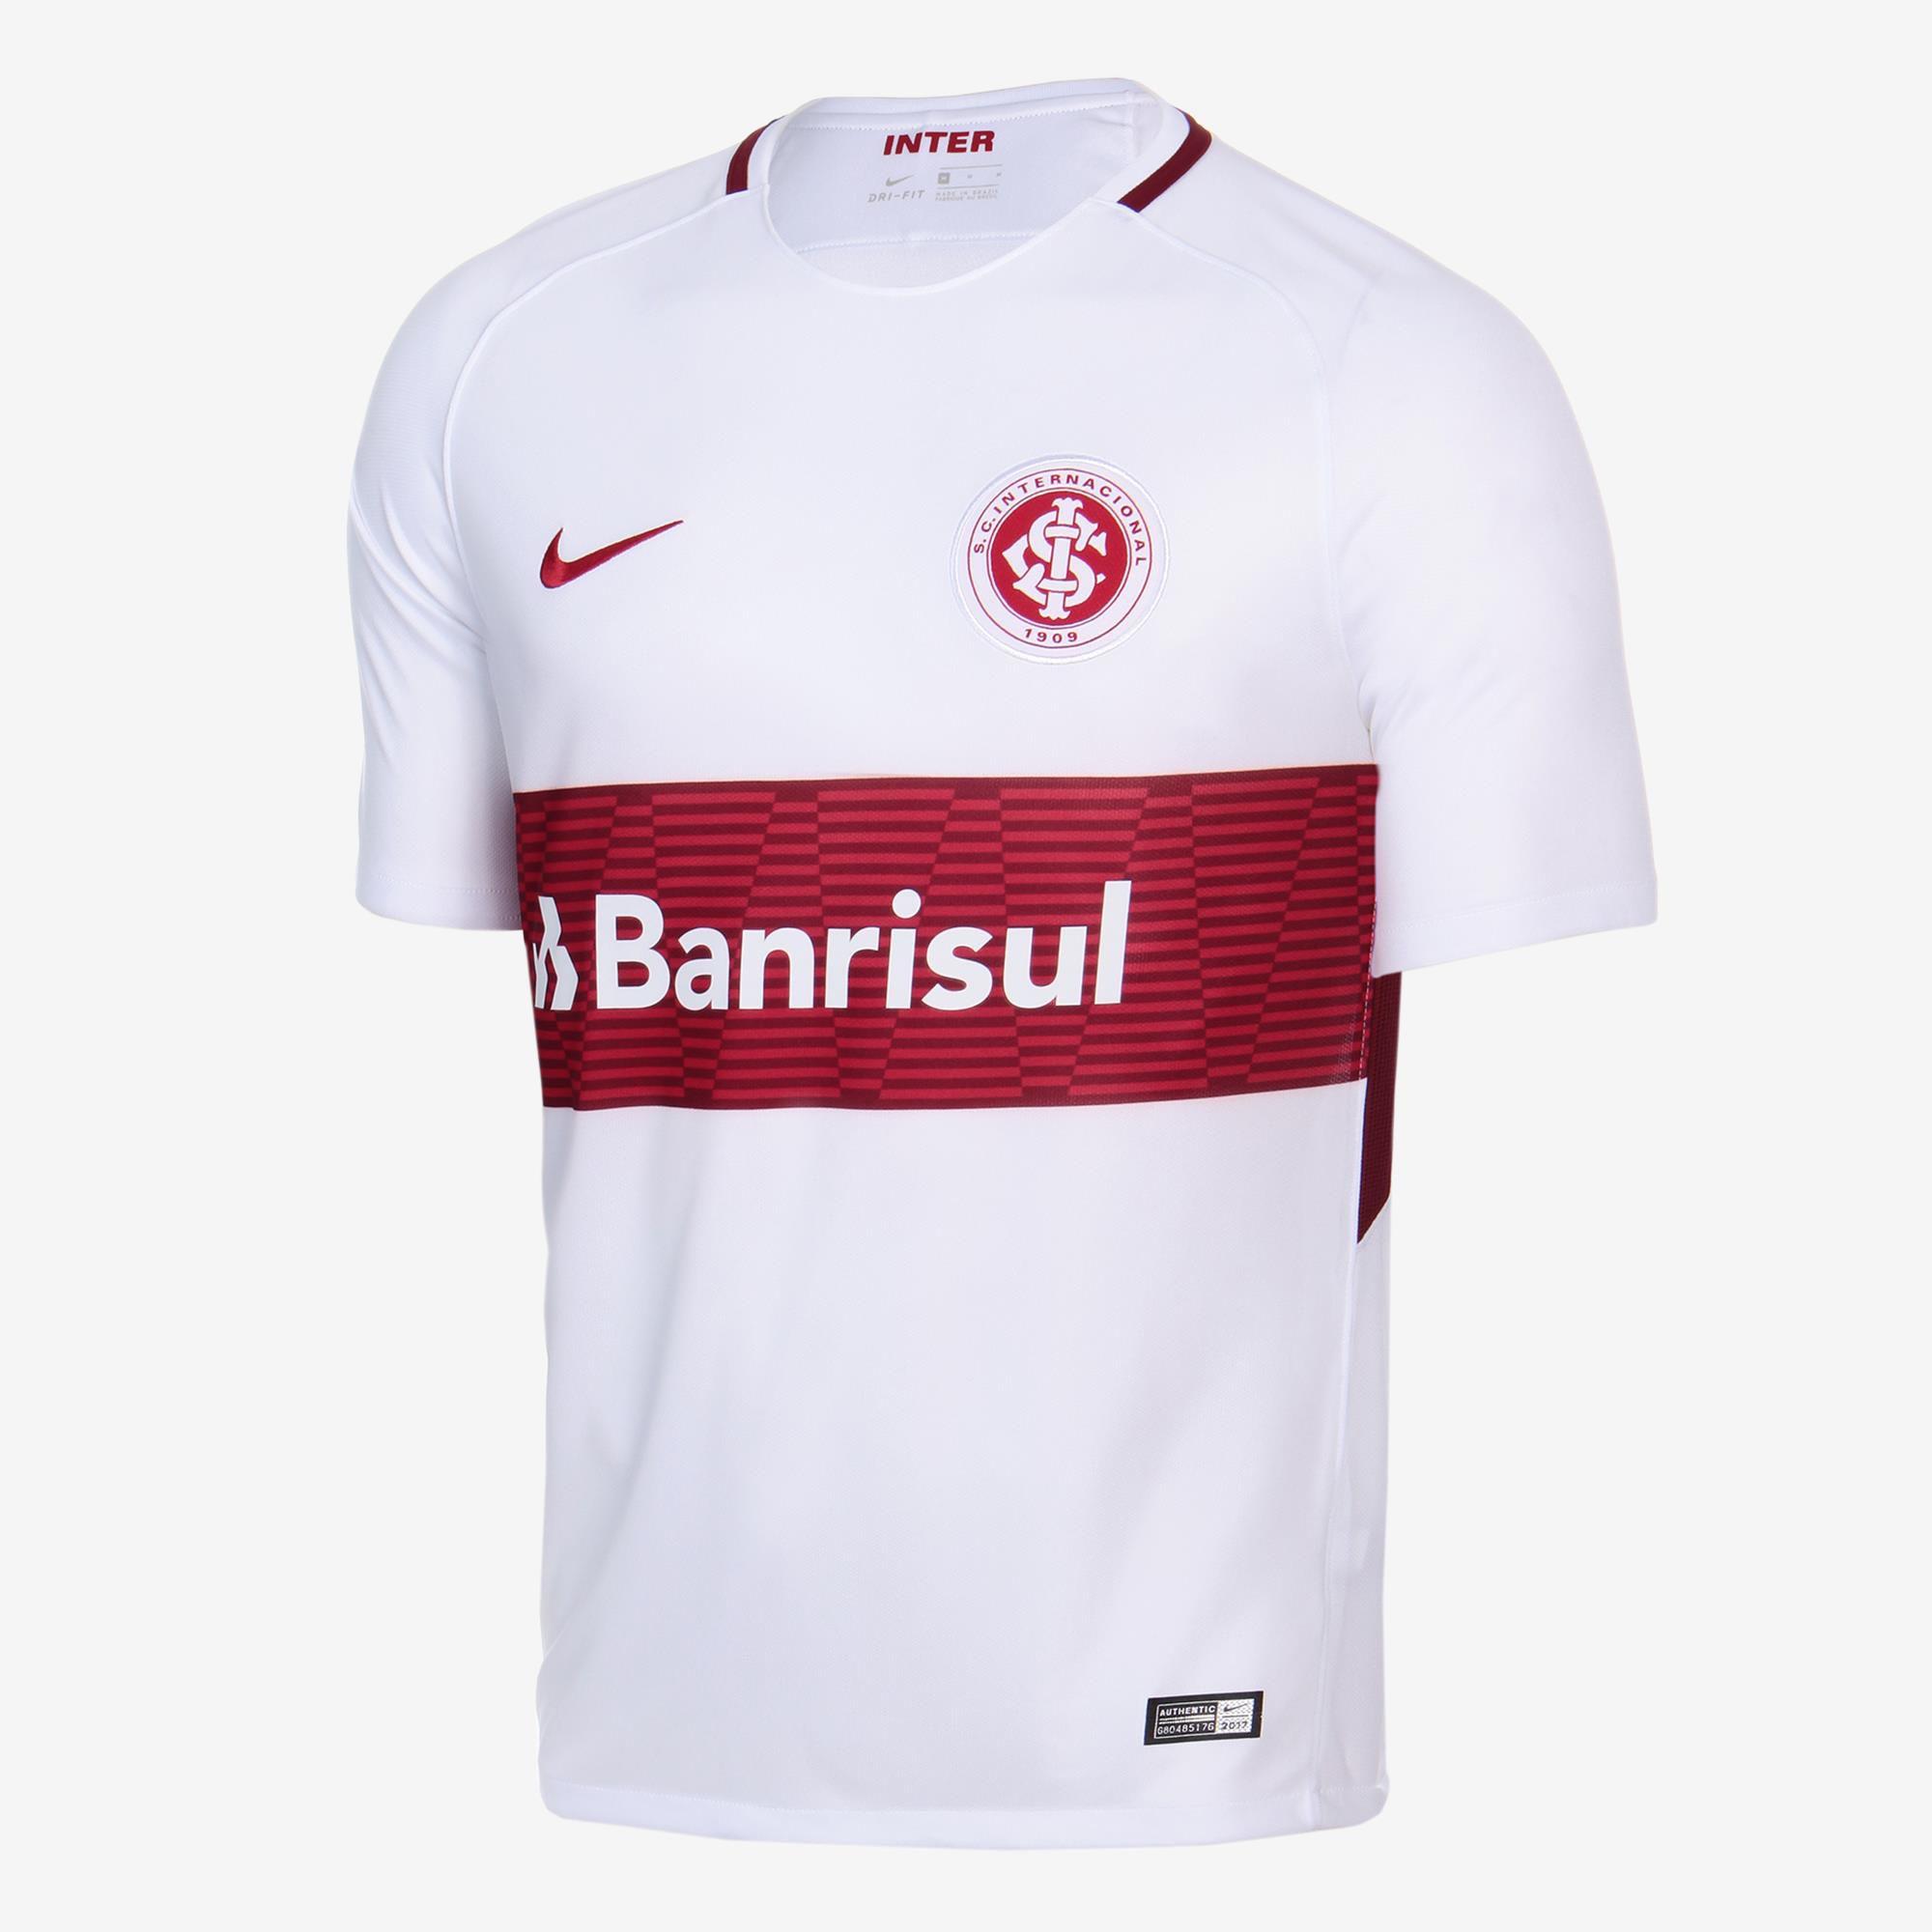 Camisa Nike Internacional Ii 17 18 S n° Torcedor - BRACIA SHOP  Loja ... f407bcc45c5be